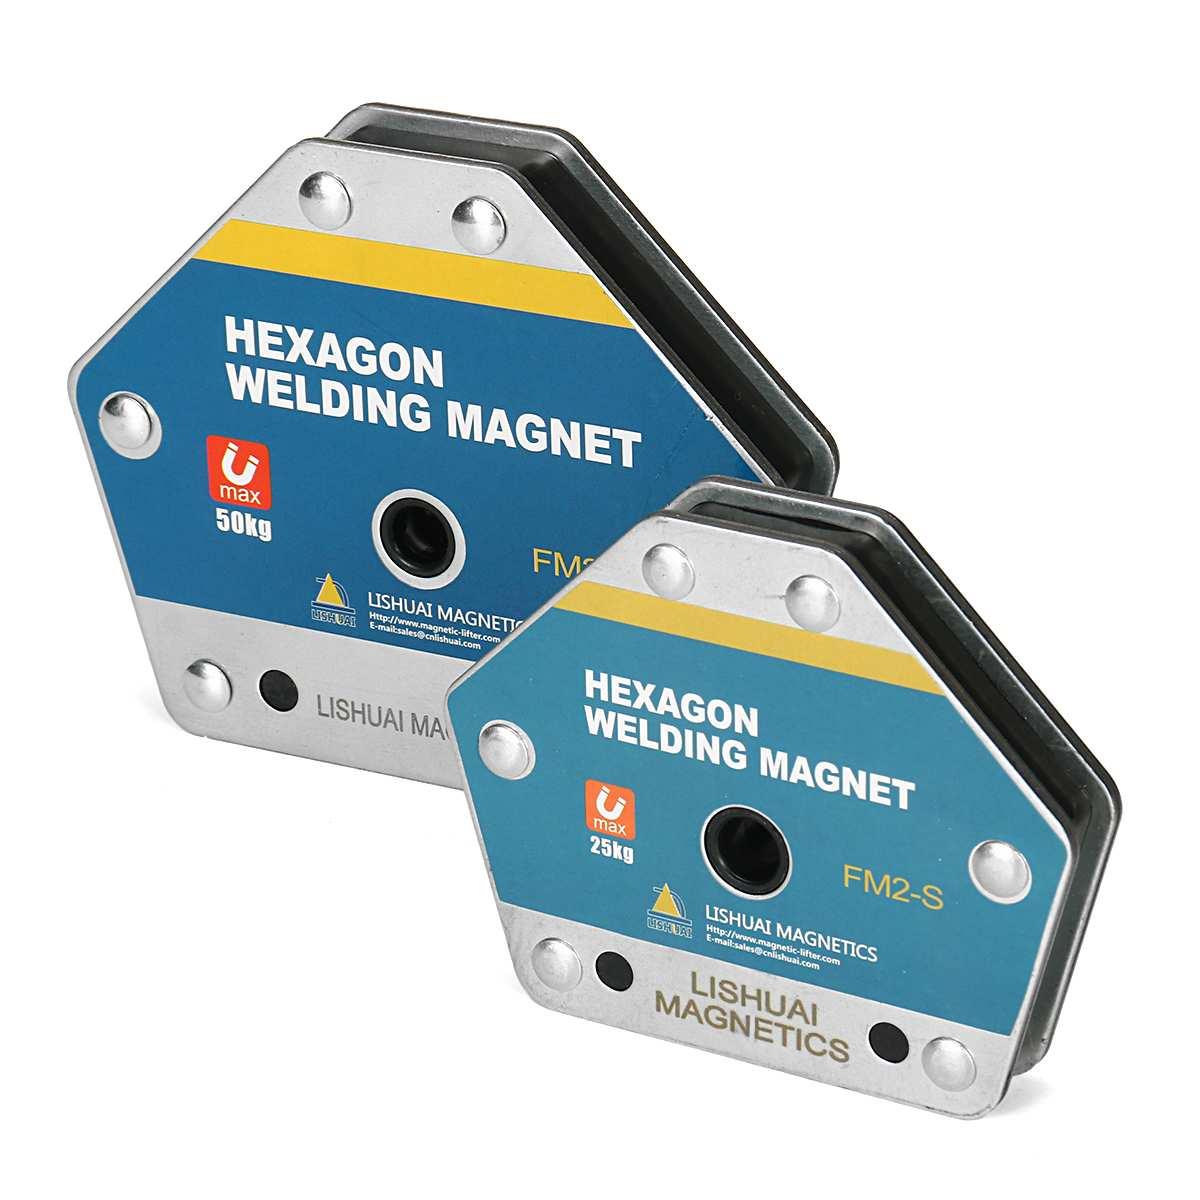 Strong Hexagon Welding Magnet Multi-angle Magnetic Clamp Welding Holder Fixer Locator FM2 S M